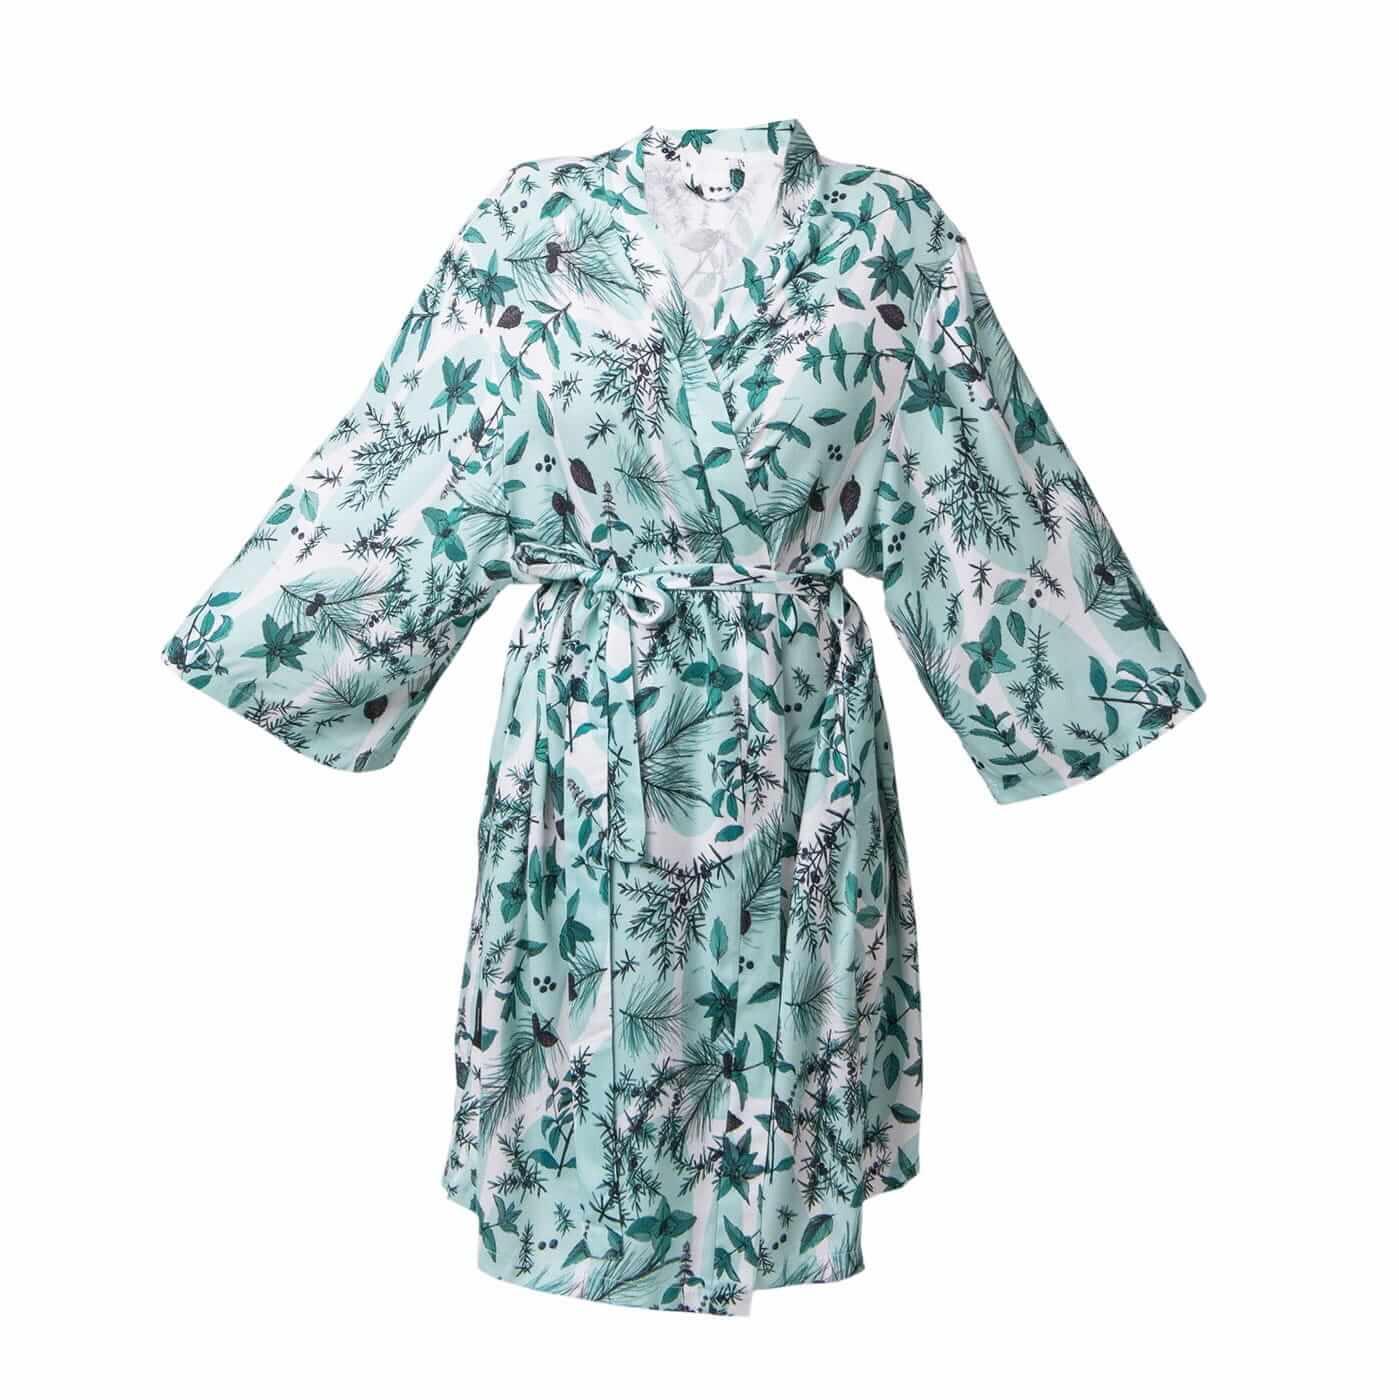 LULLALOVE Kimono Bambusowe Ziołowa Łąka | SoBio Beauty Boutique | Cruelty Free Concept Store